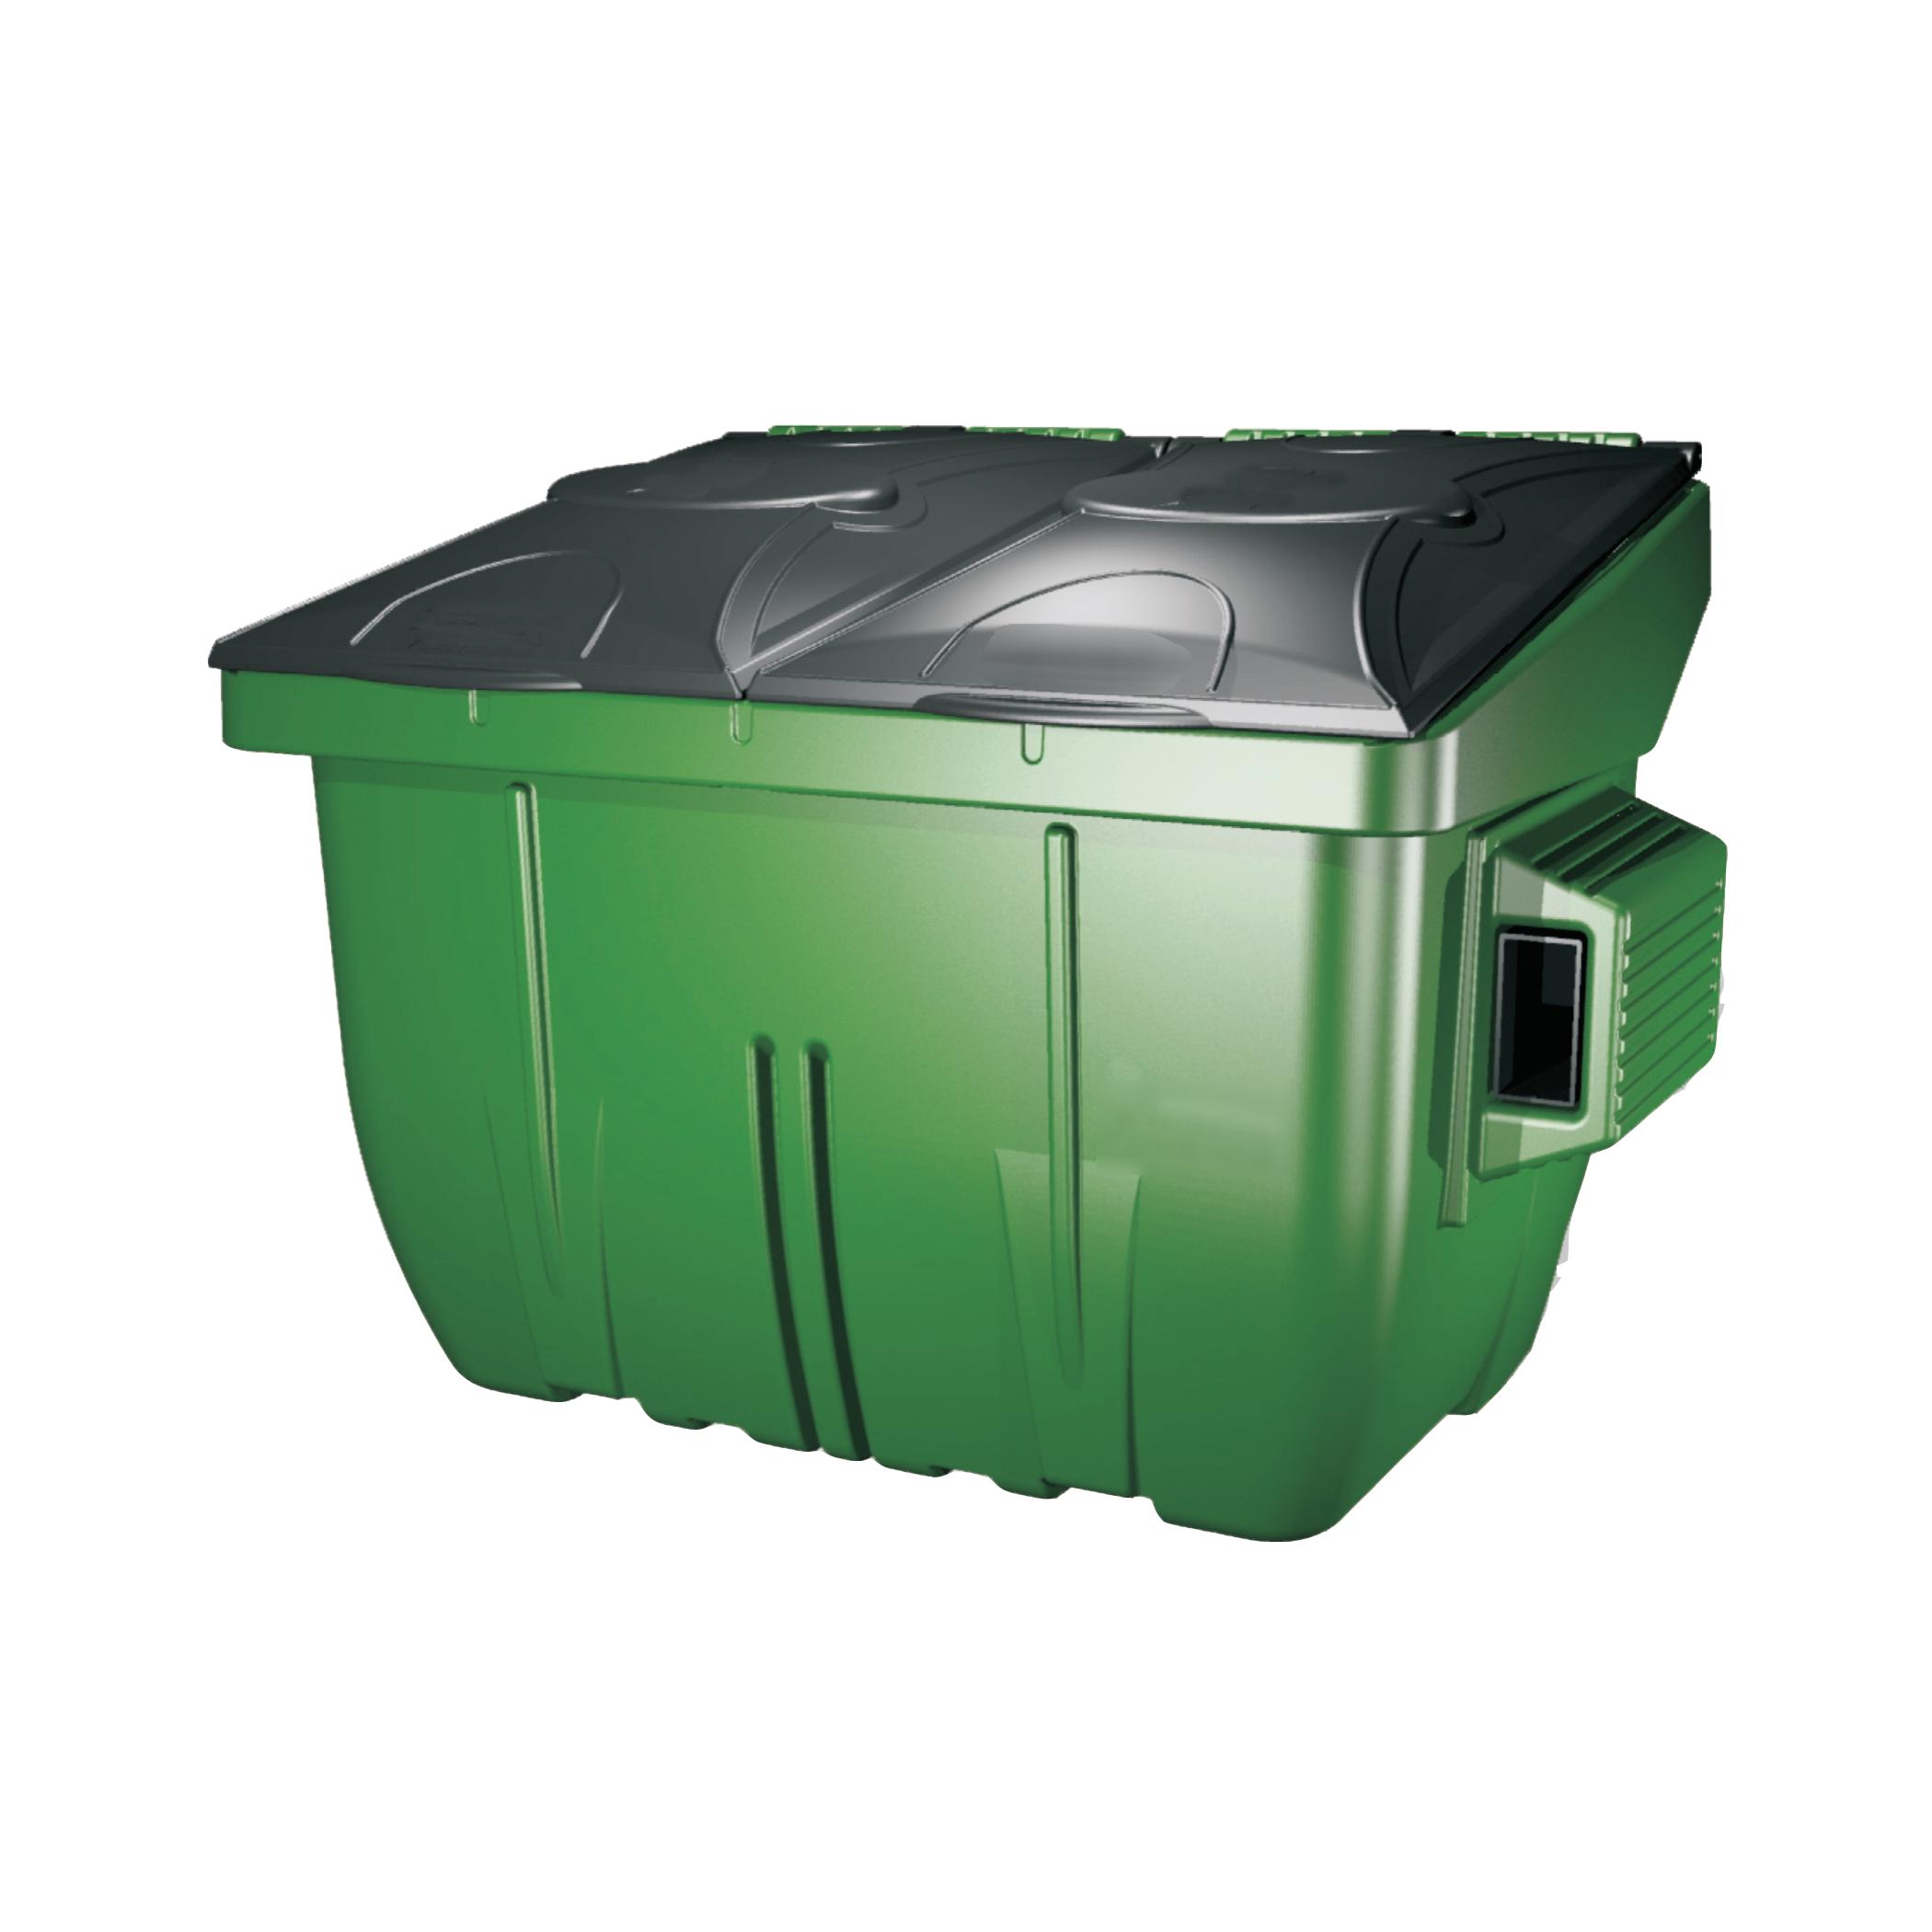 Plastic 4 Yard Waste Dumpster Diversified Plastics Inc